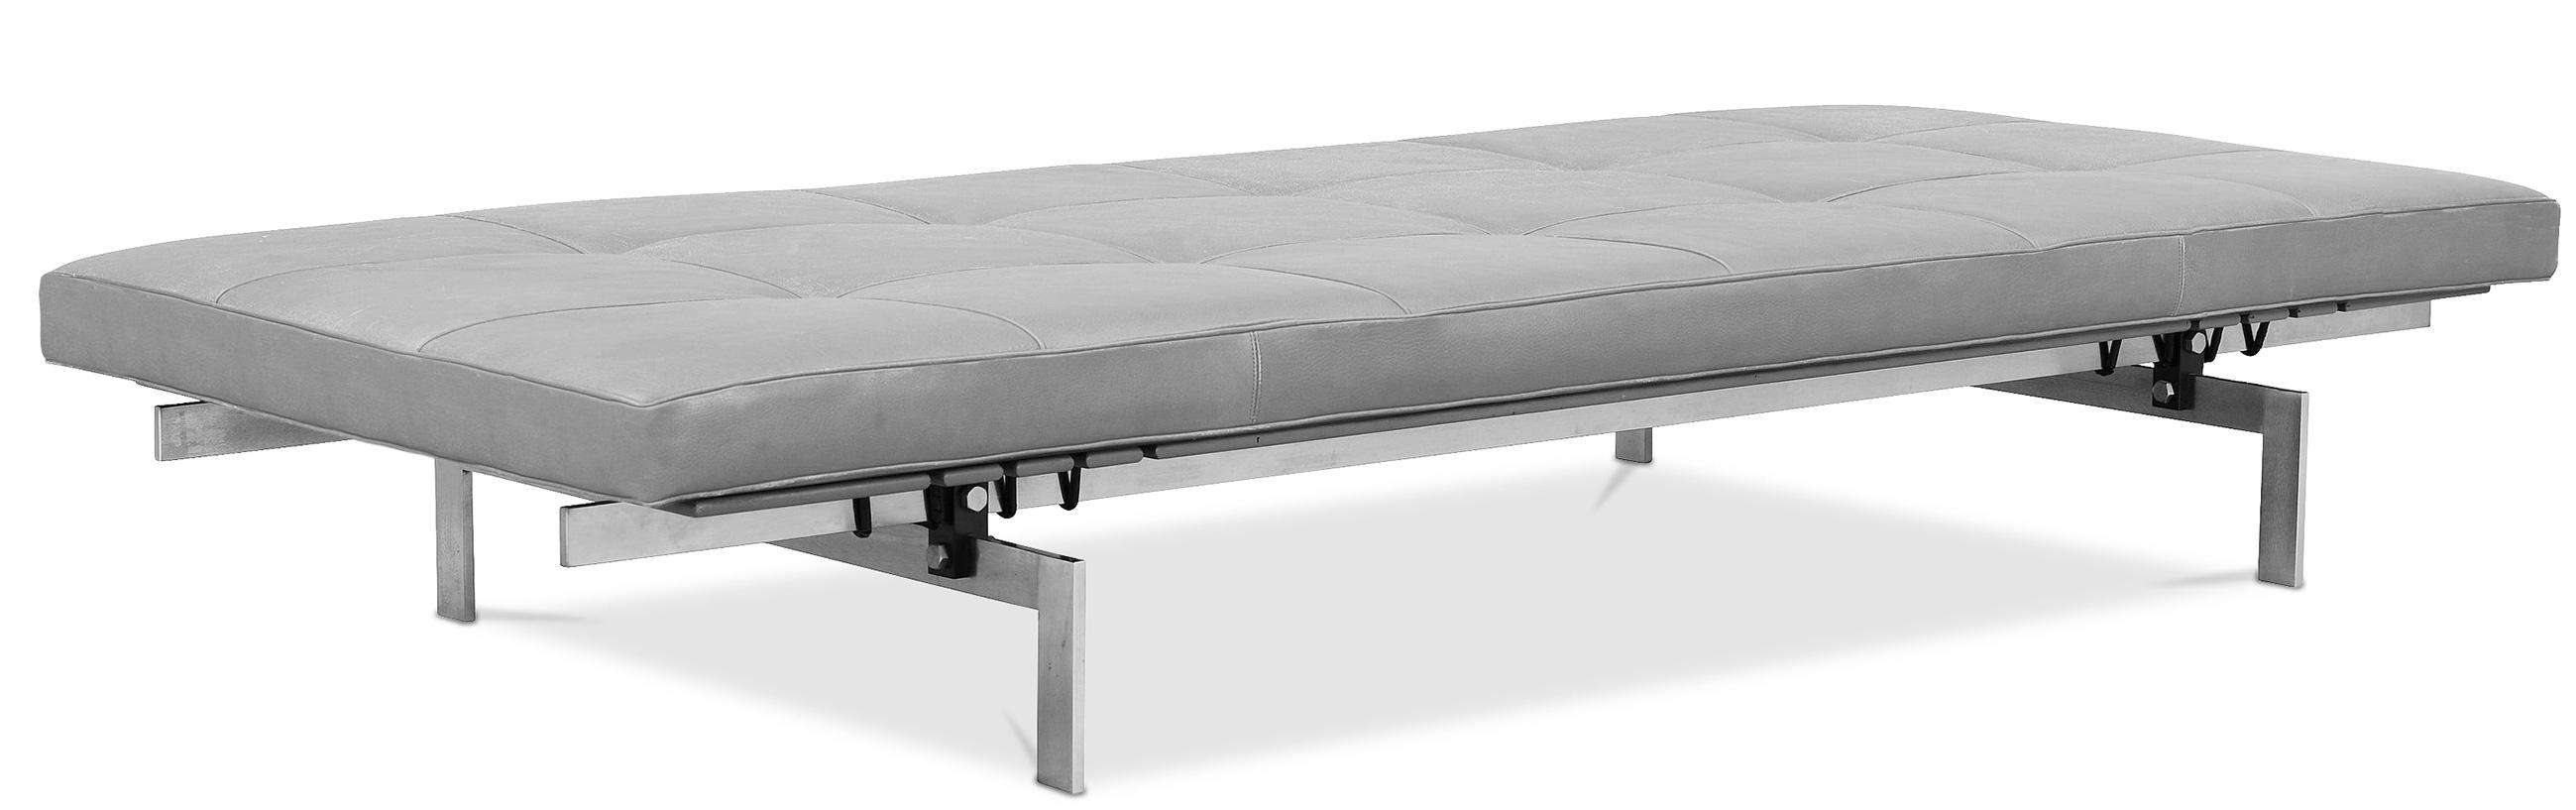 banc cuir gris barca. Black Bedroom Furniture Sets. Home Design Ideas